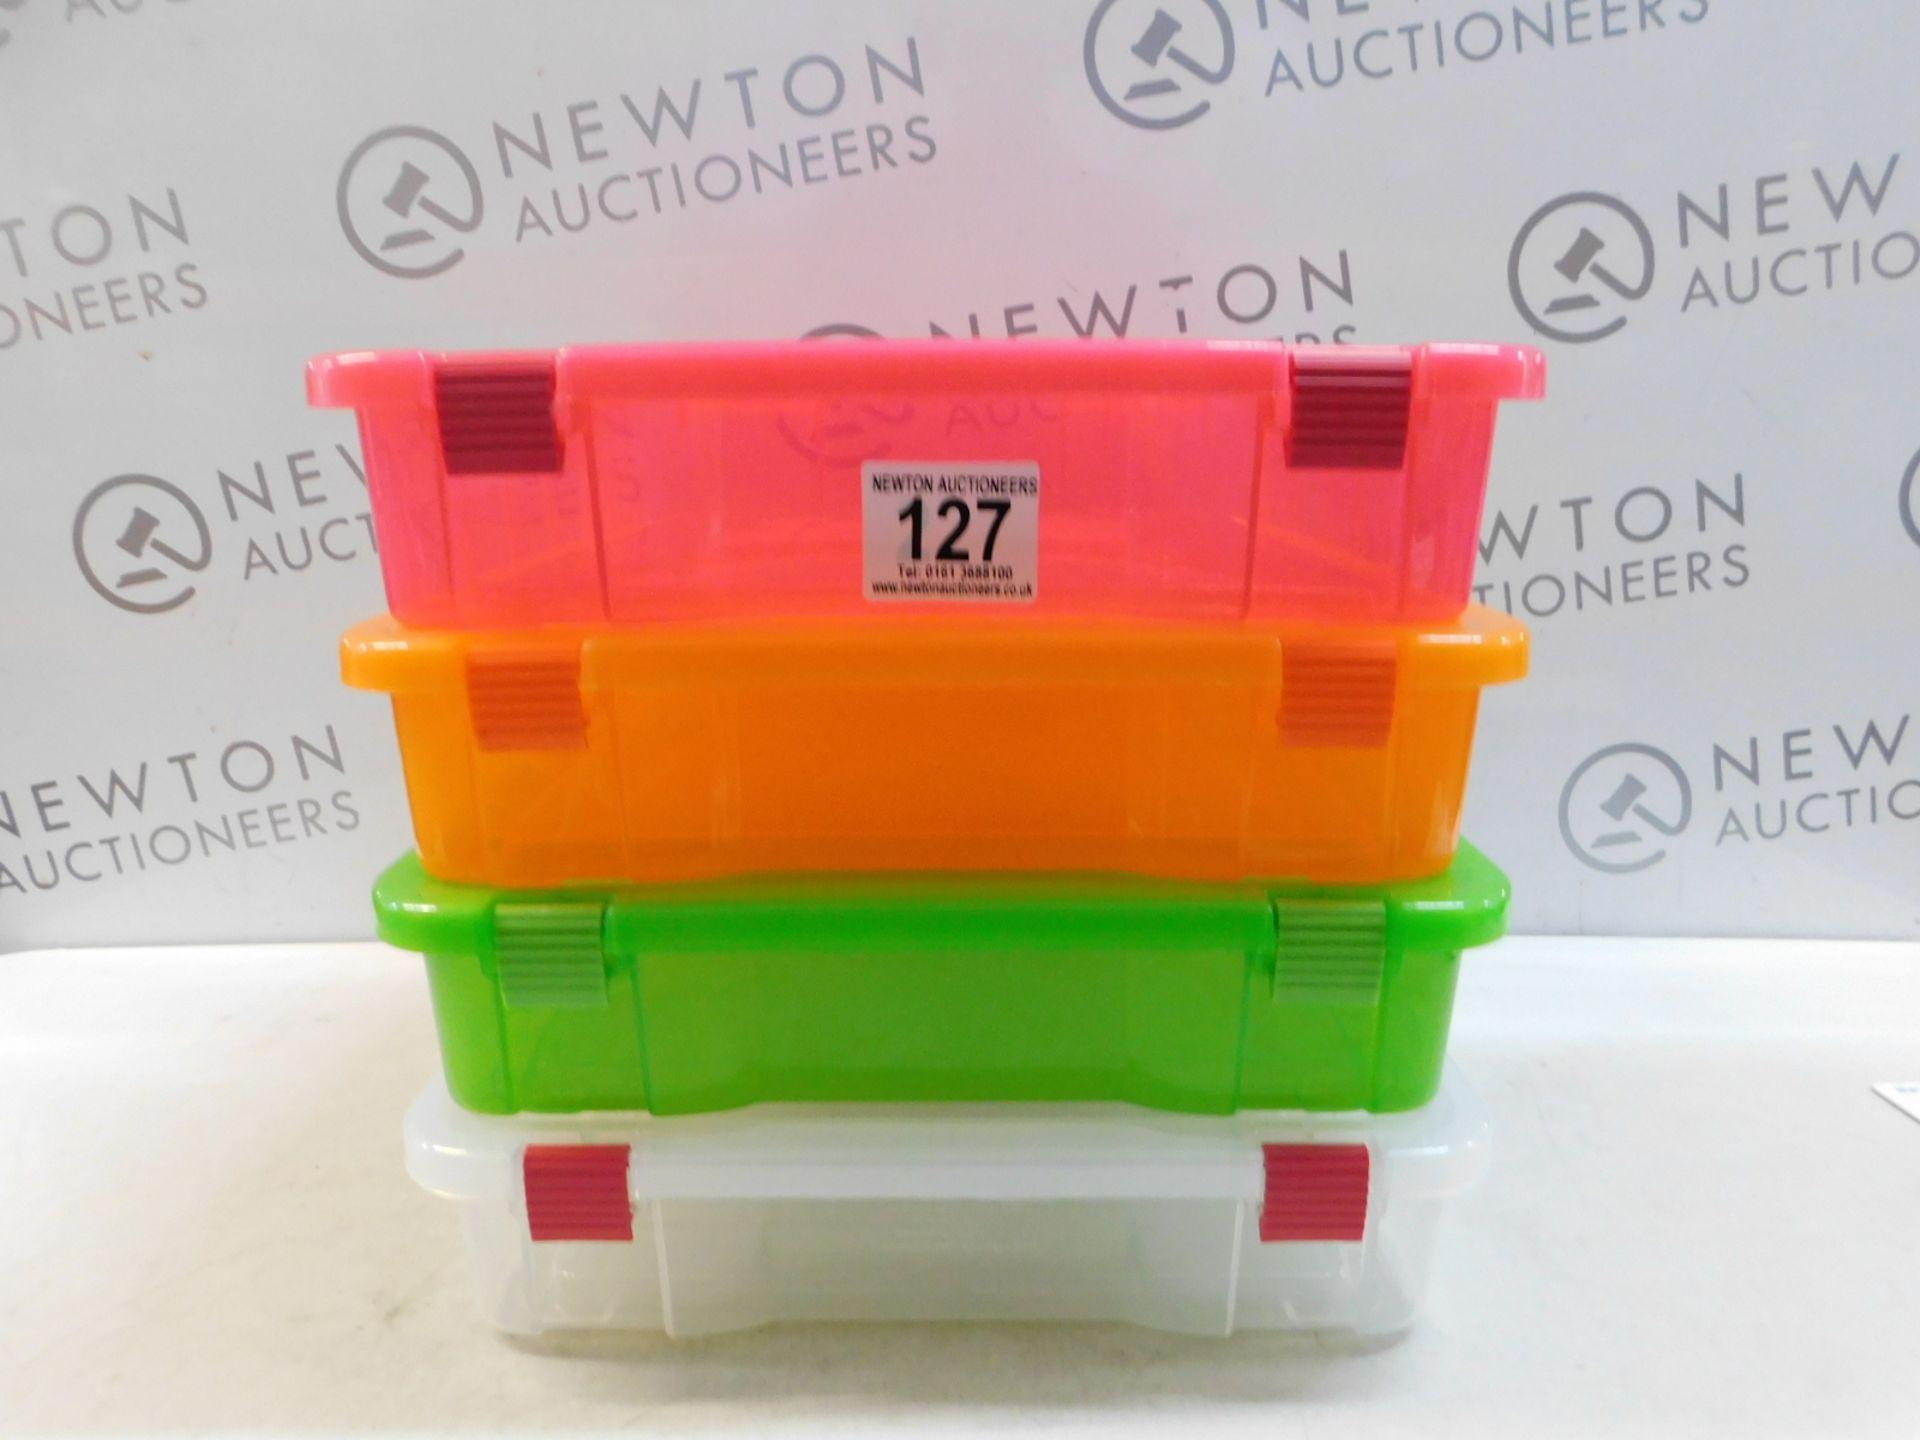 Lot 127 - 1 CREATIVE OPTIONS PROJECT BOX 5 PIECE SET RRP £29.99